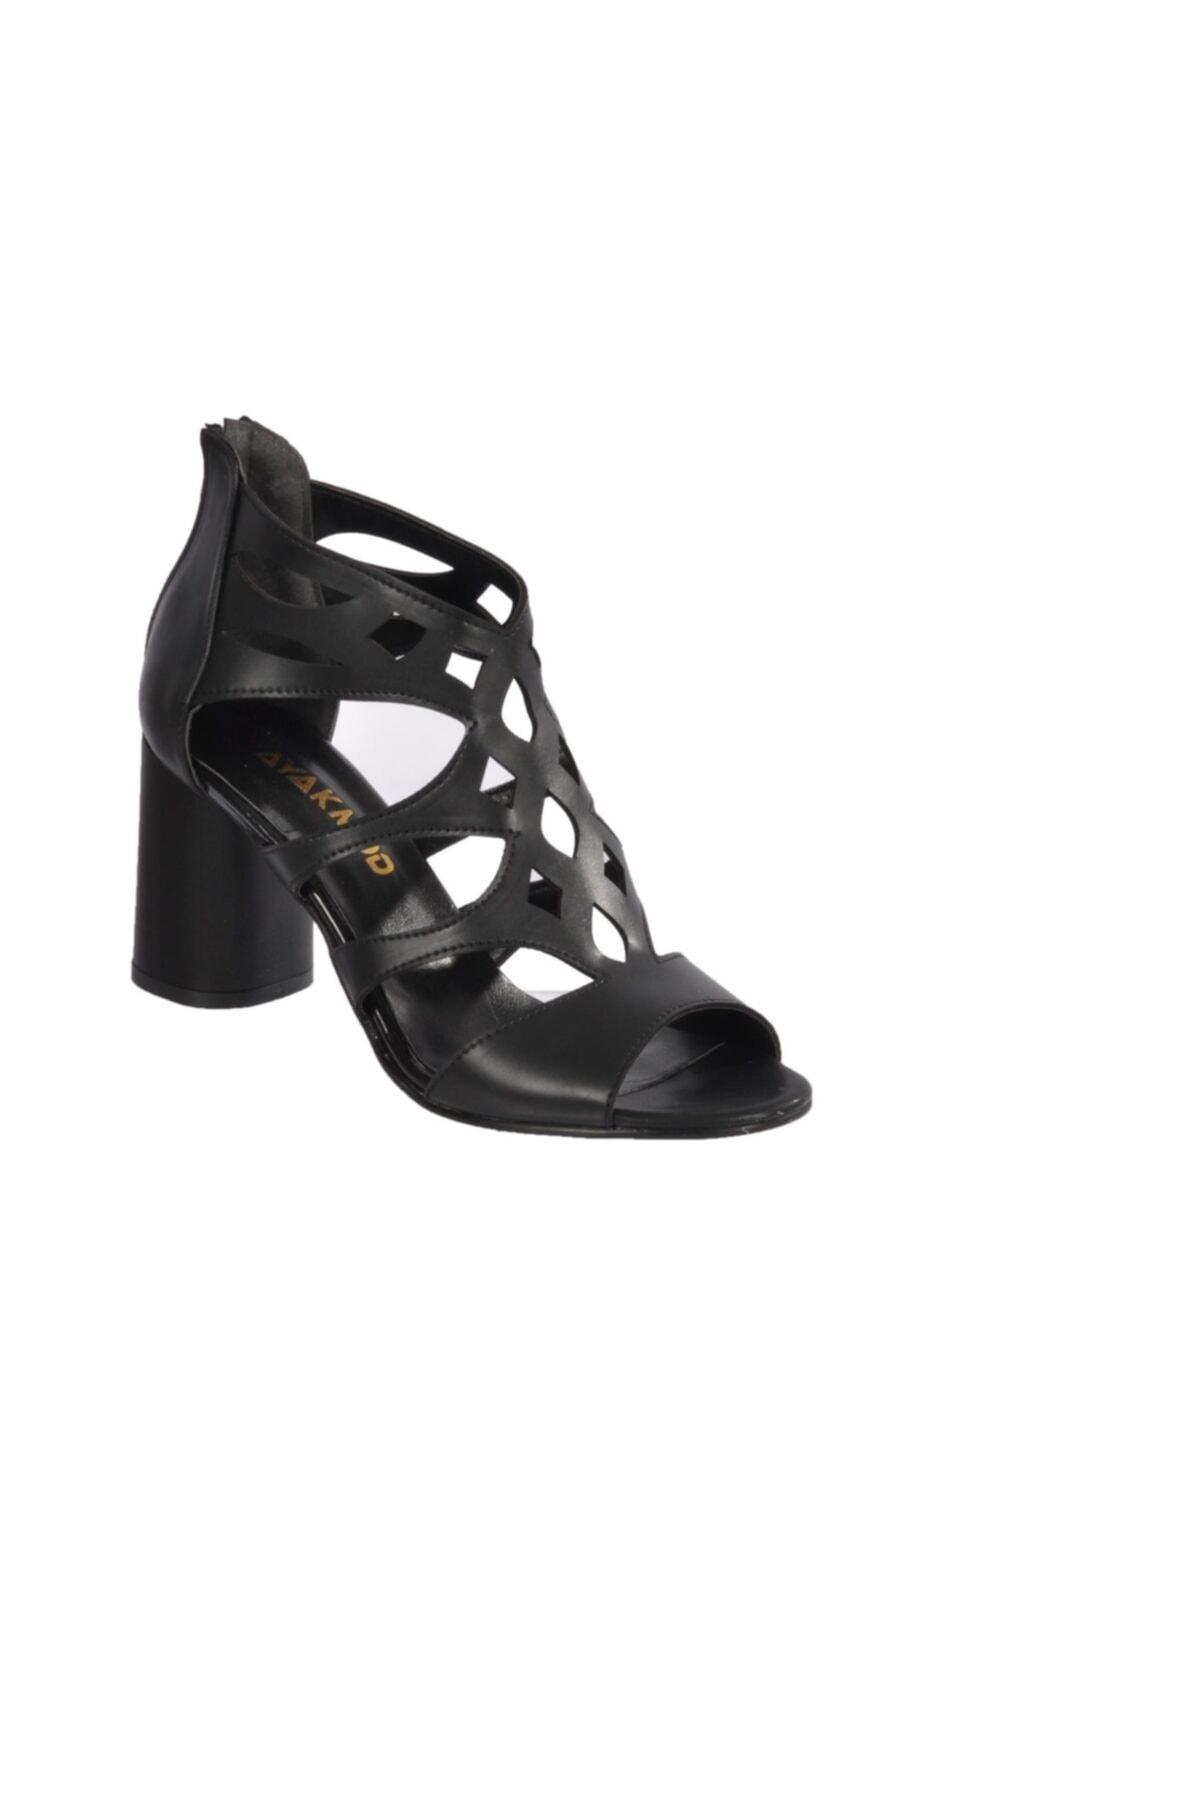 Maje Kadın 9837 Siyah Topuklu Ayakkabı